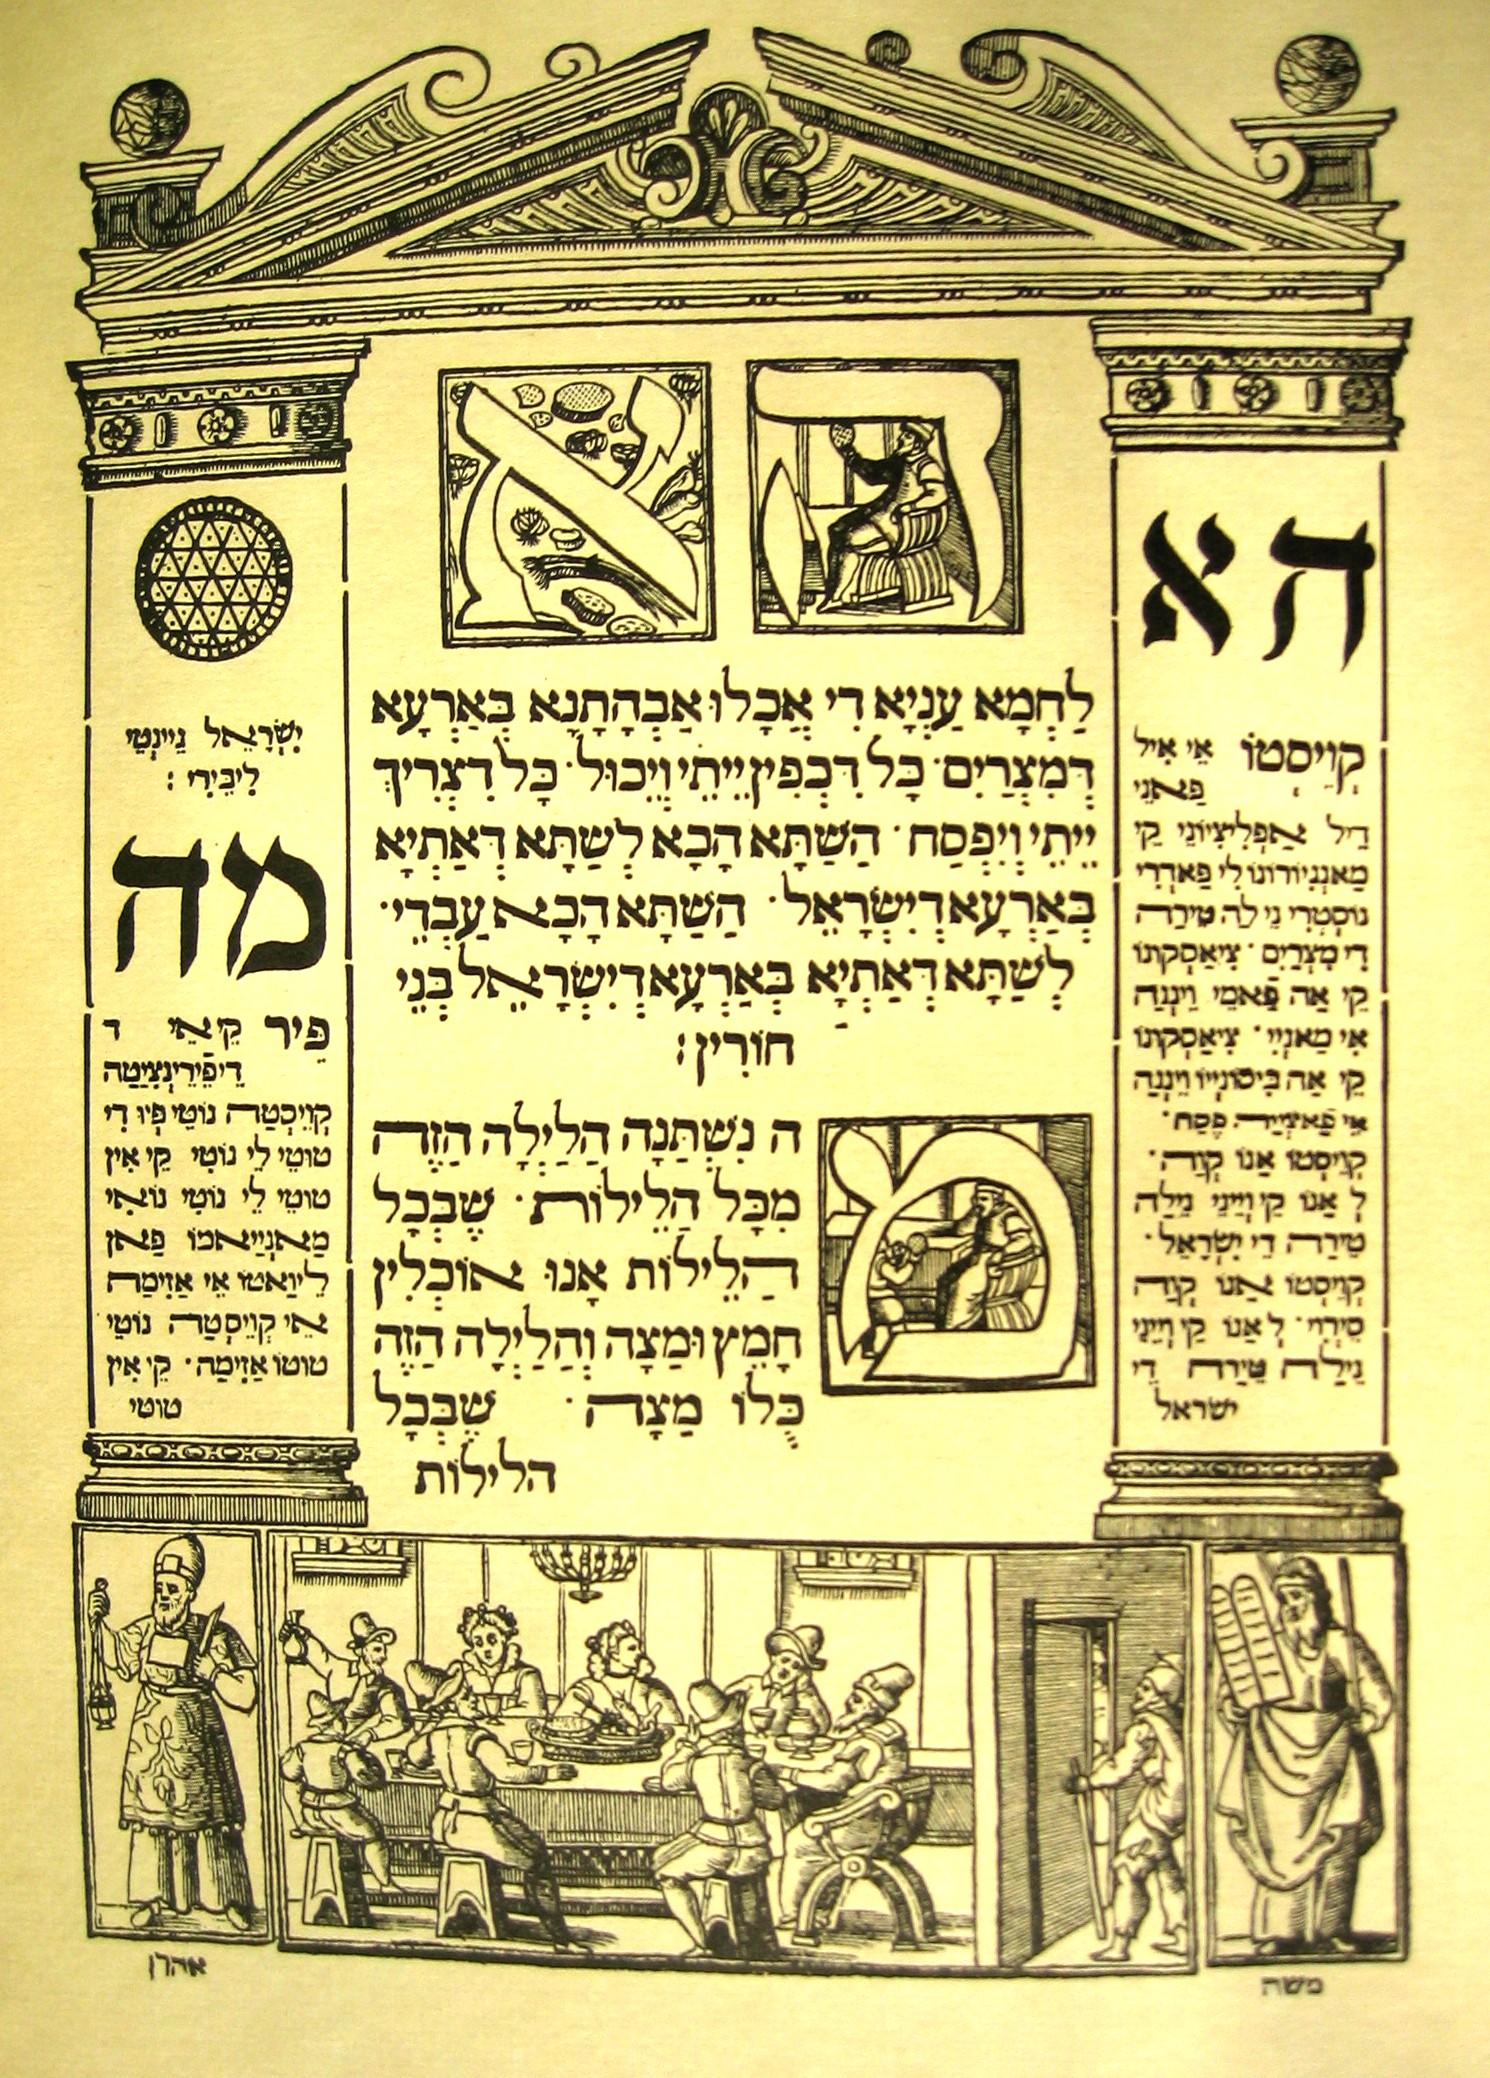 First page of haggadah text (Venice Haggadah)